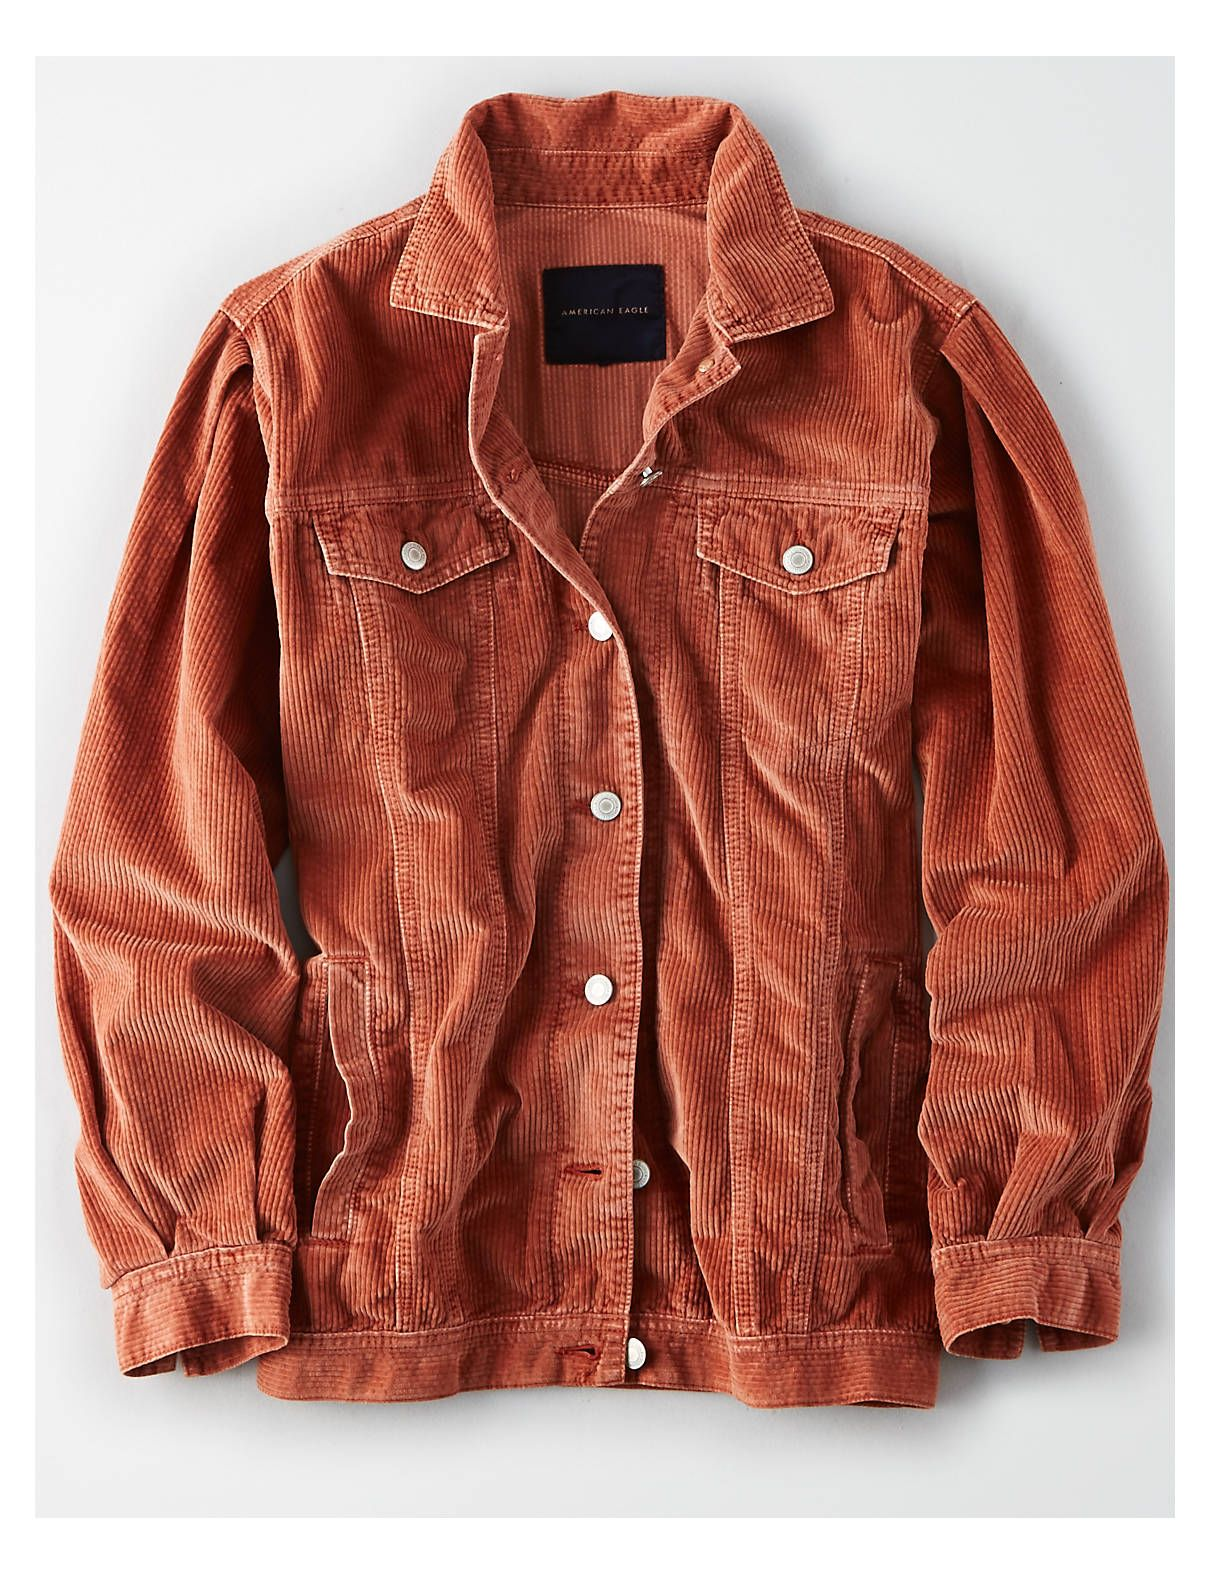 Ae Corduroy Trucker Jacket Rust American Eagle Outfitters Corduroy Jacket Womens Corduroy Jacket Trucker Jacket Outfit [ 1575 x 1211 Pixel ]